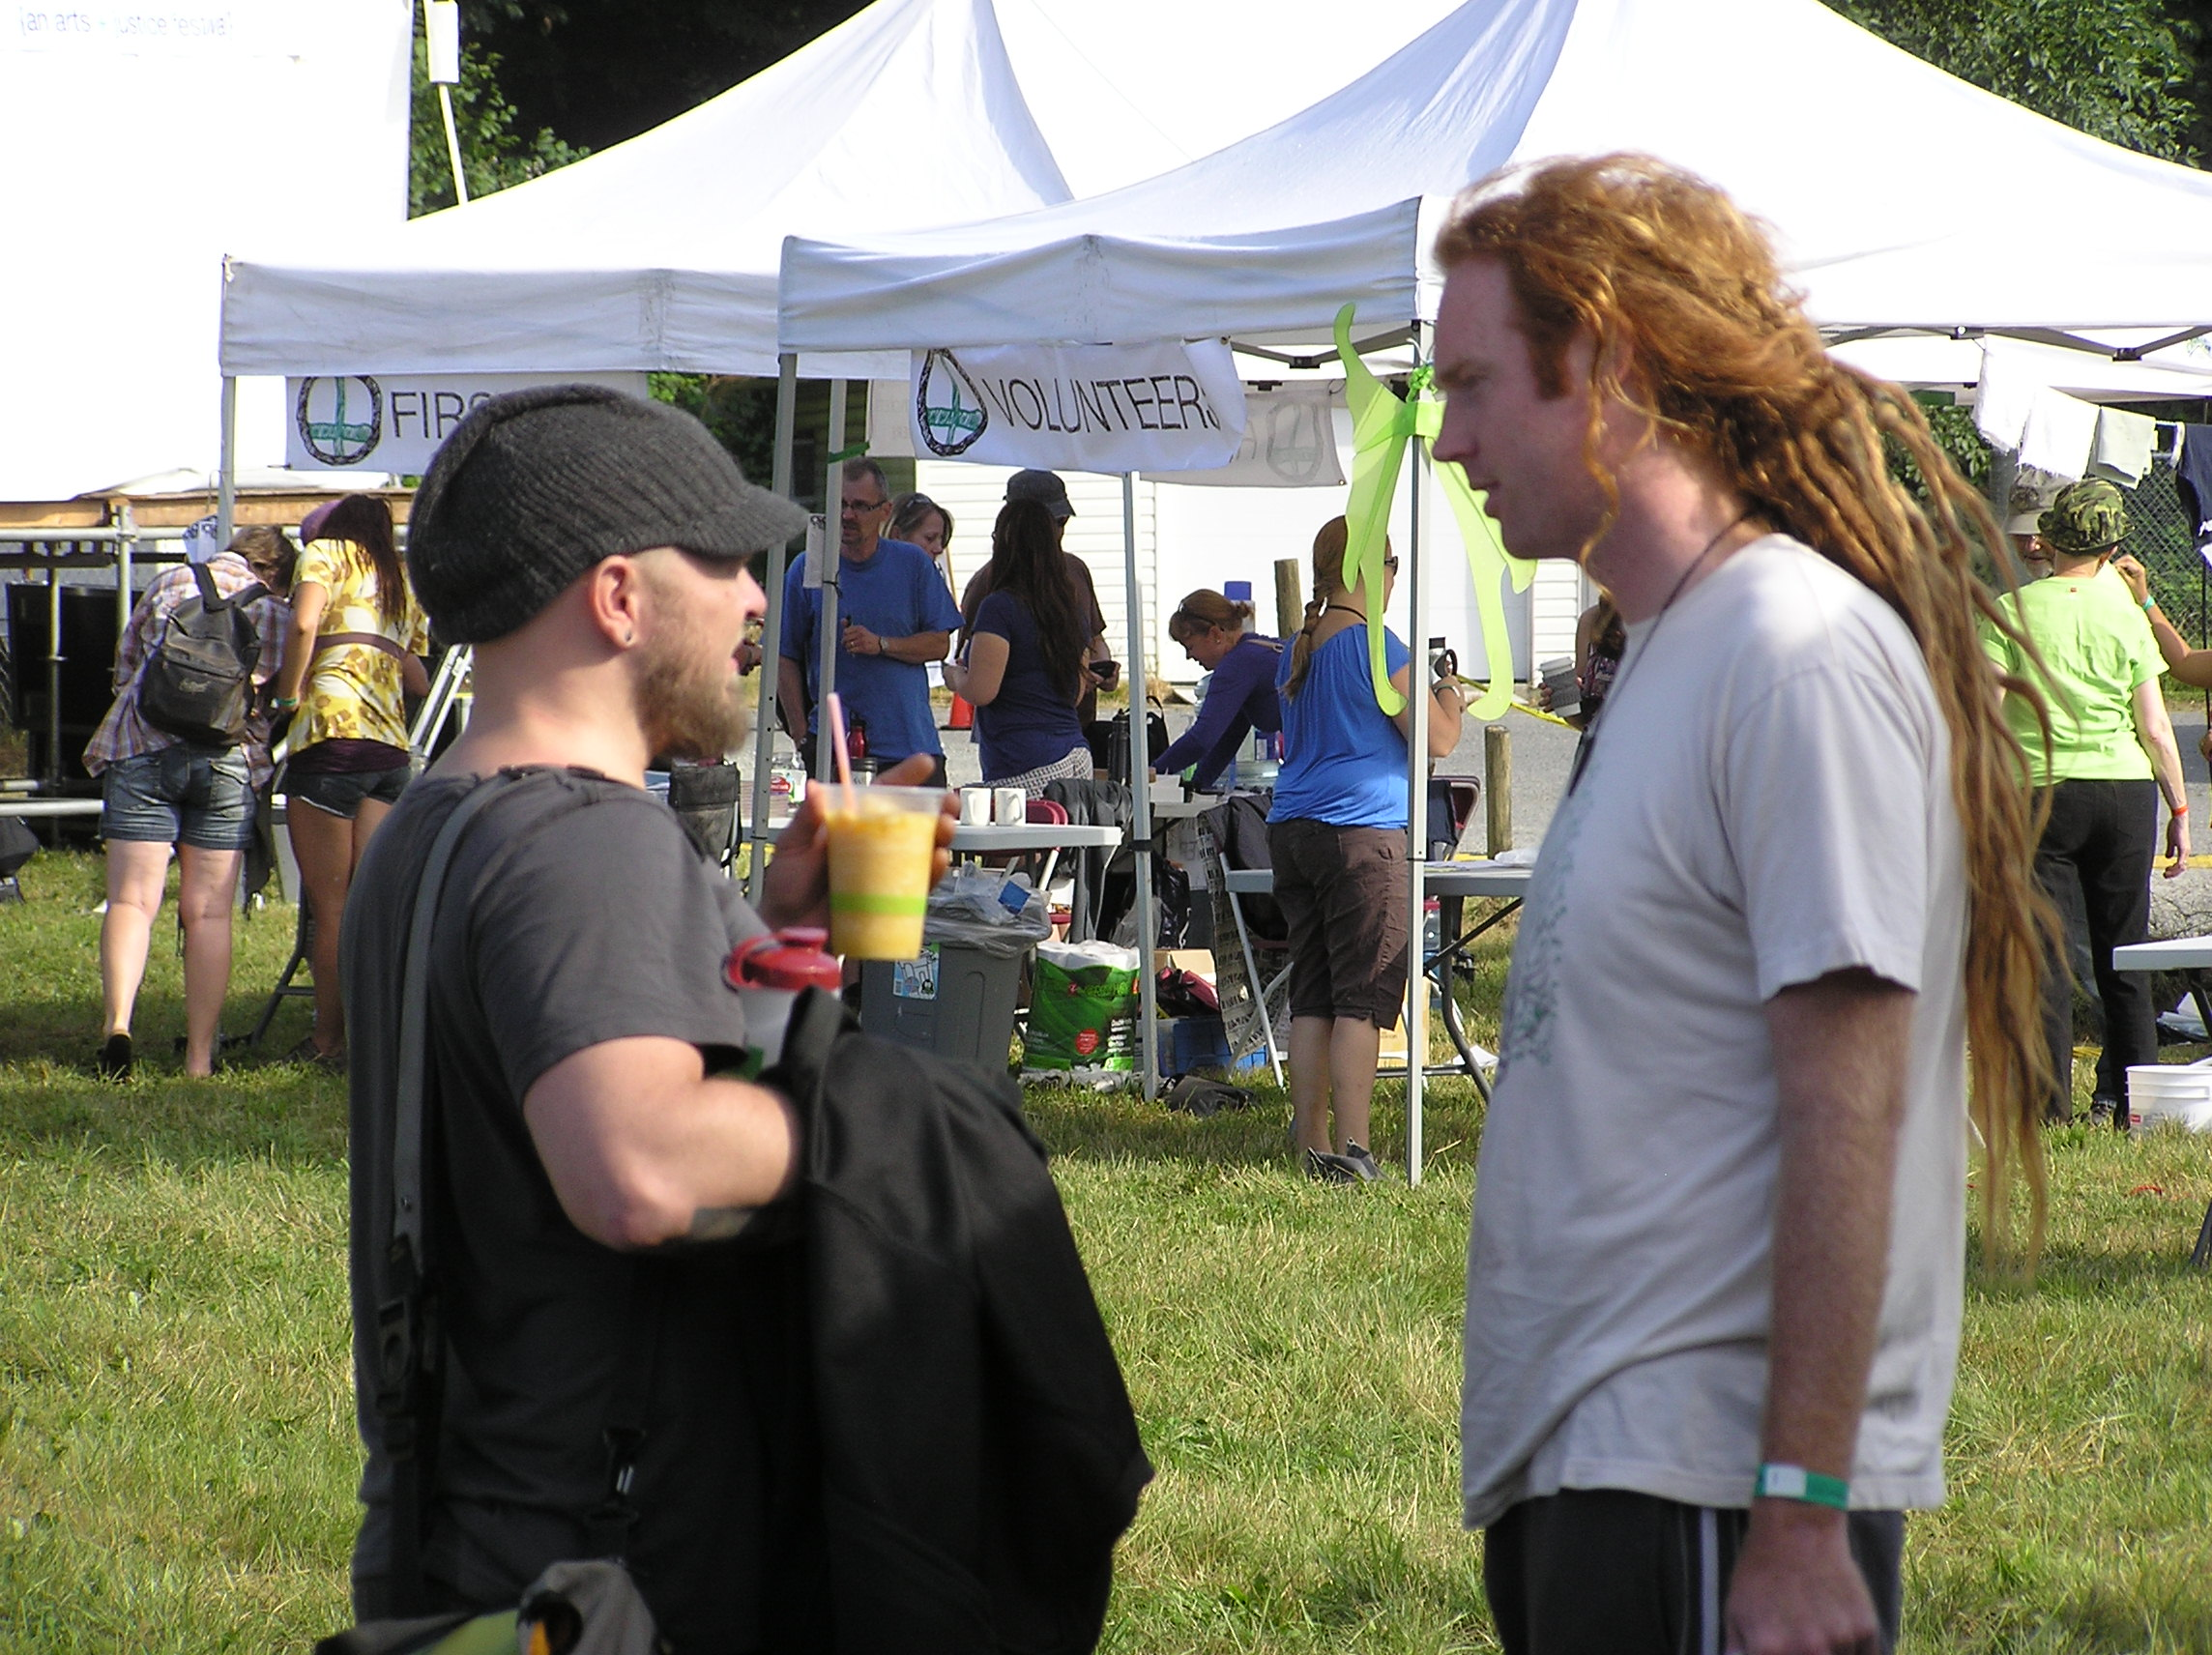 Aaron Strumpel and Joel McKerrow at Creative World Festival